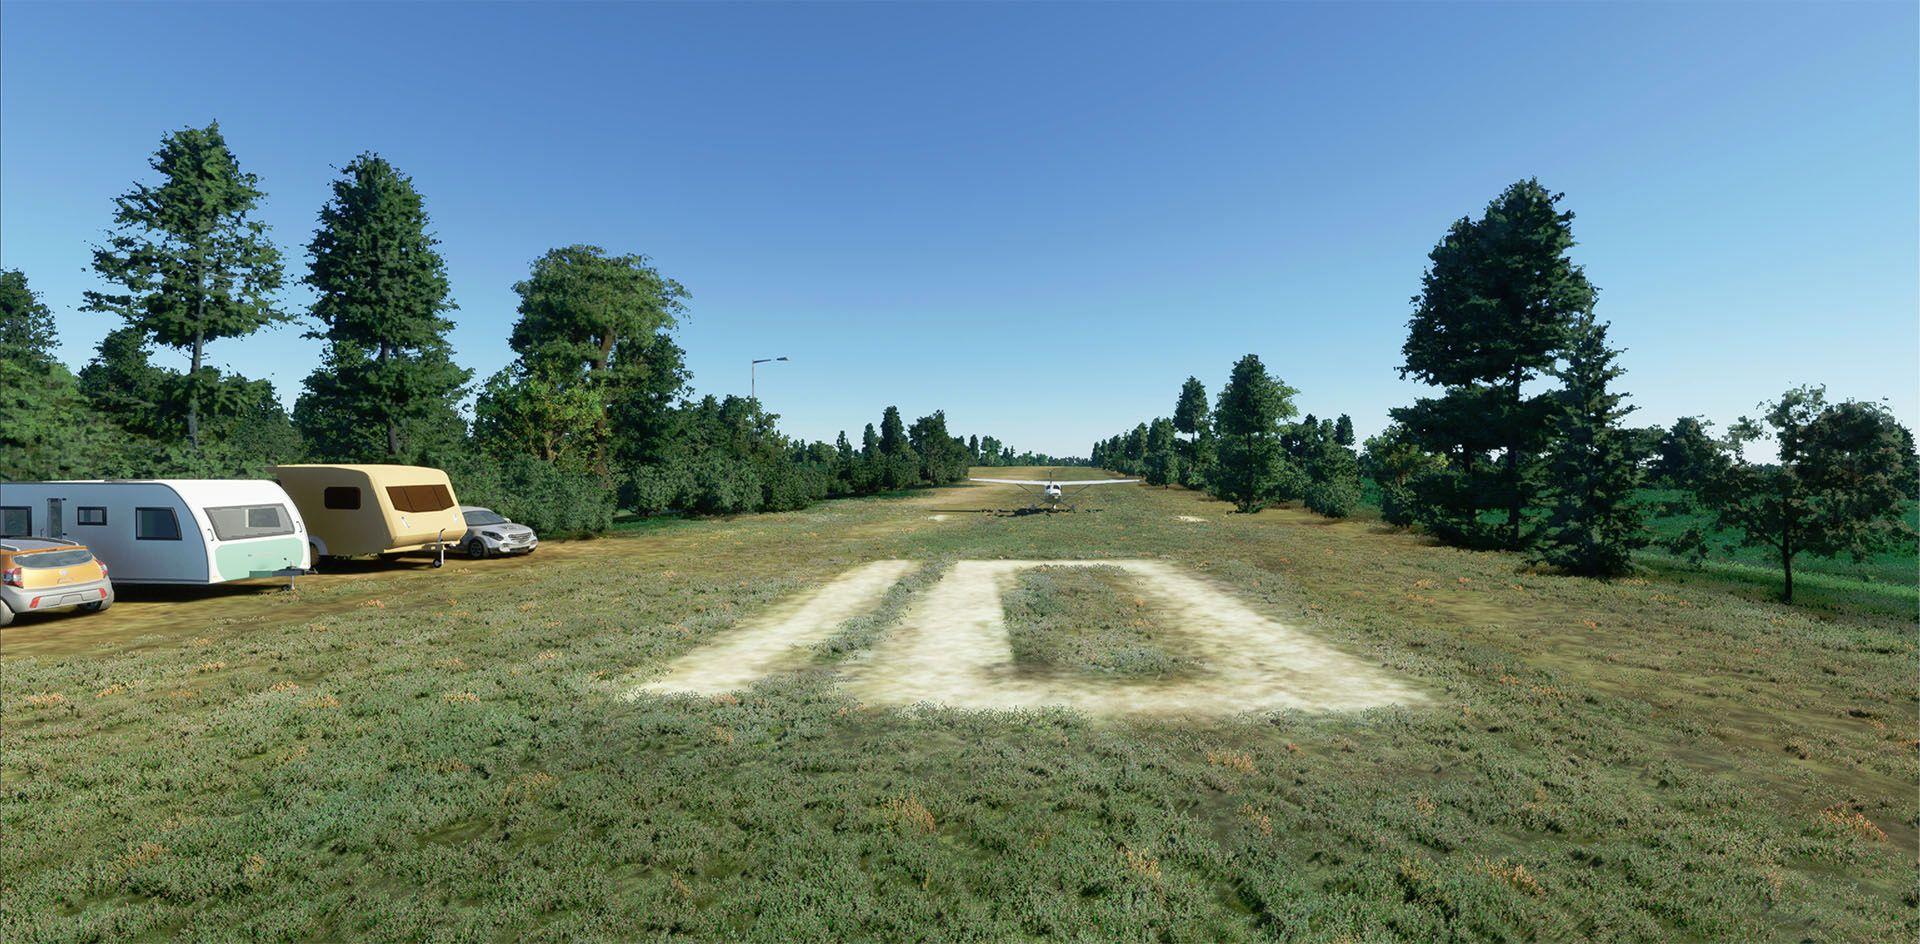 MSFS Branscombe Airfield